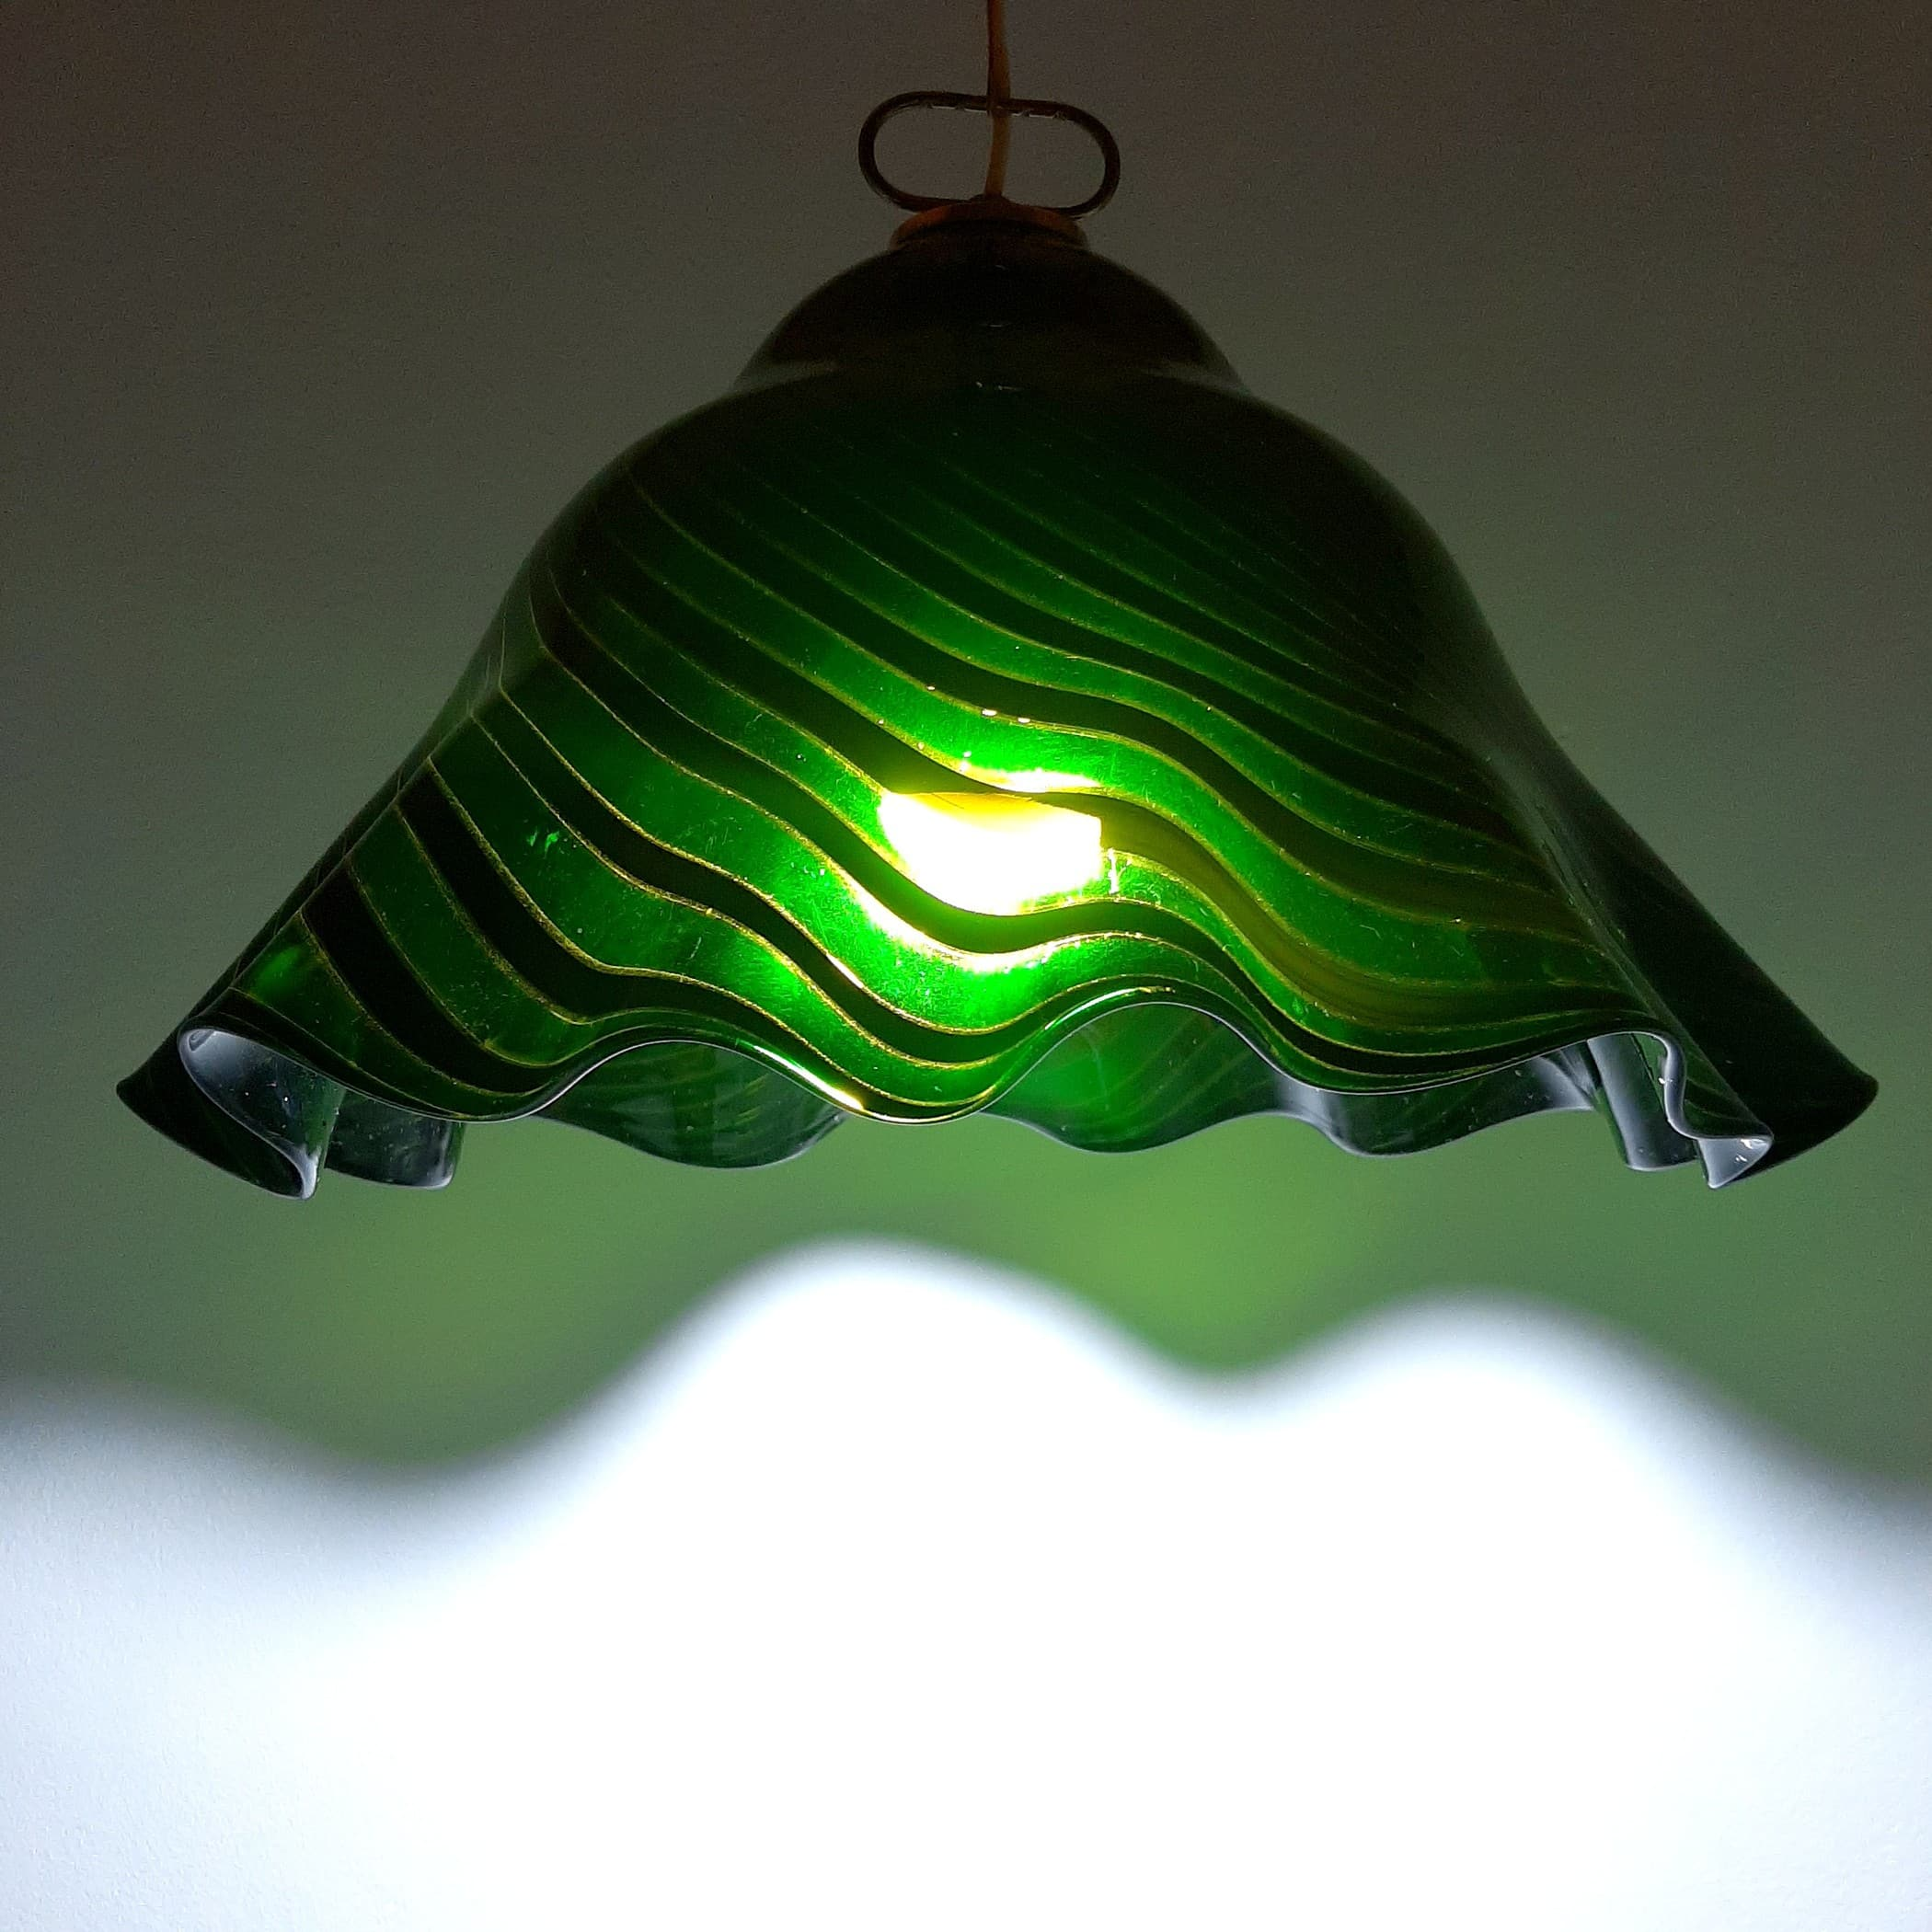 Vintage green murano glass pendant lamp Romano Mazzega Italy 1930s